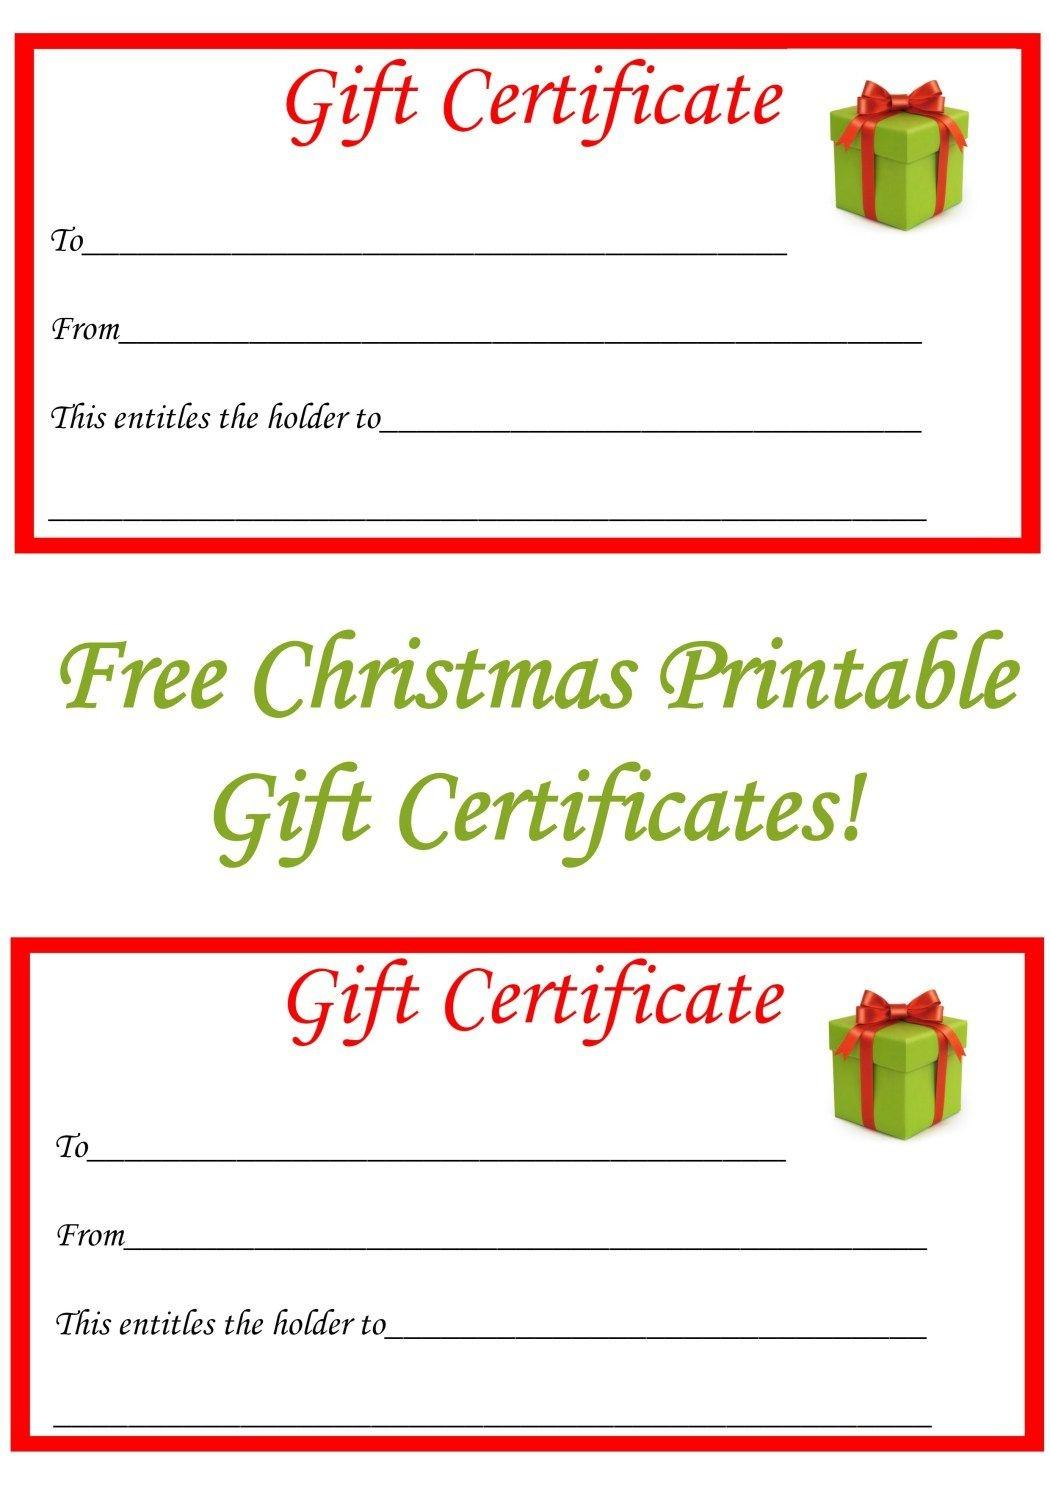 Free Christmas Printable Gift Certificates | Gift Ideas | Christmas - Free Printable Gift Certificates